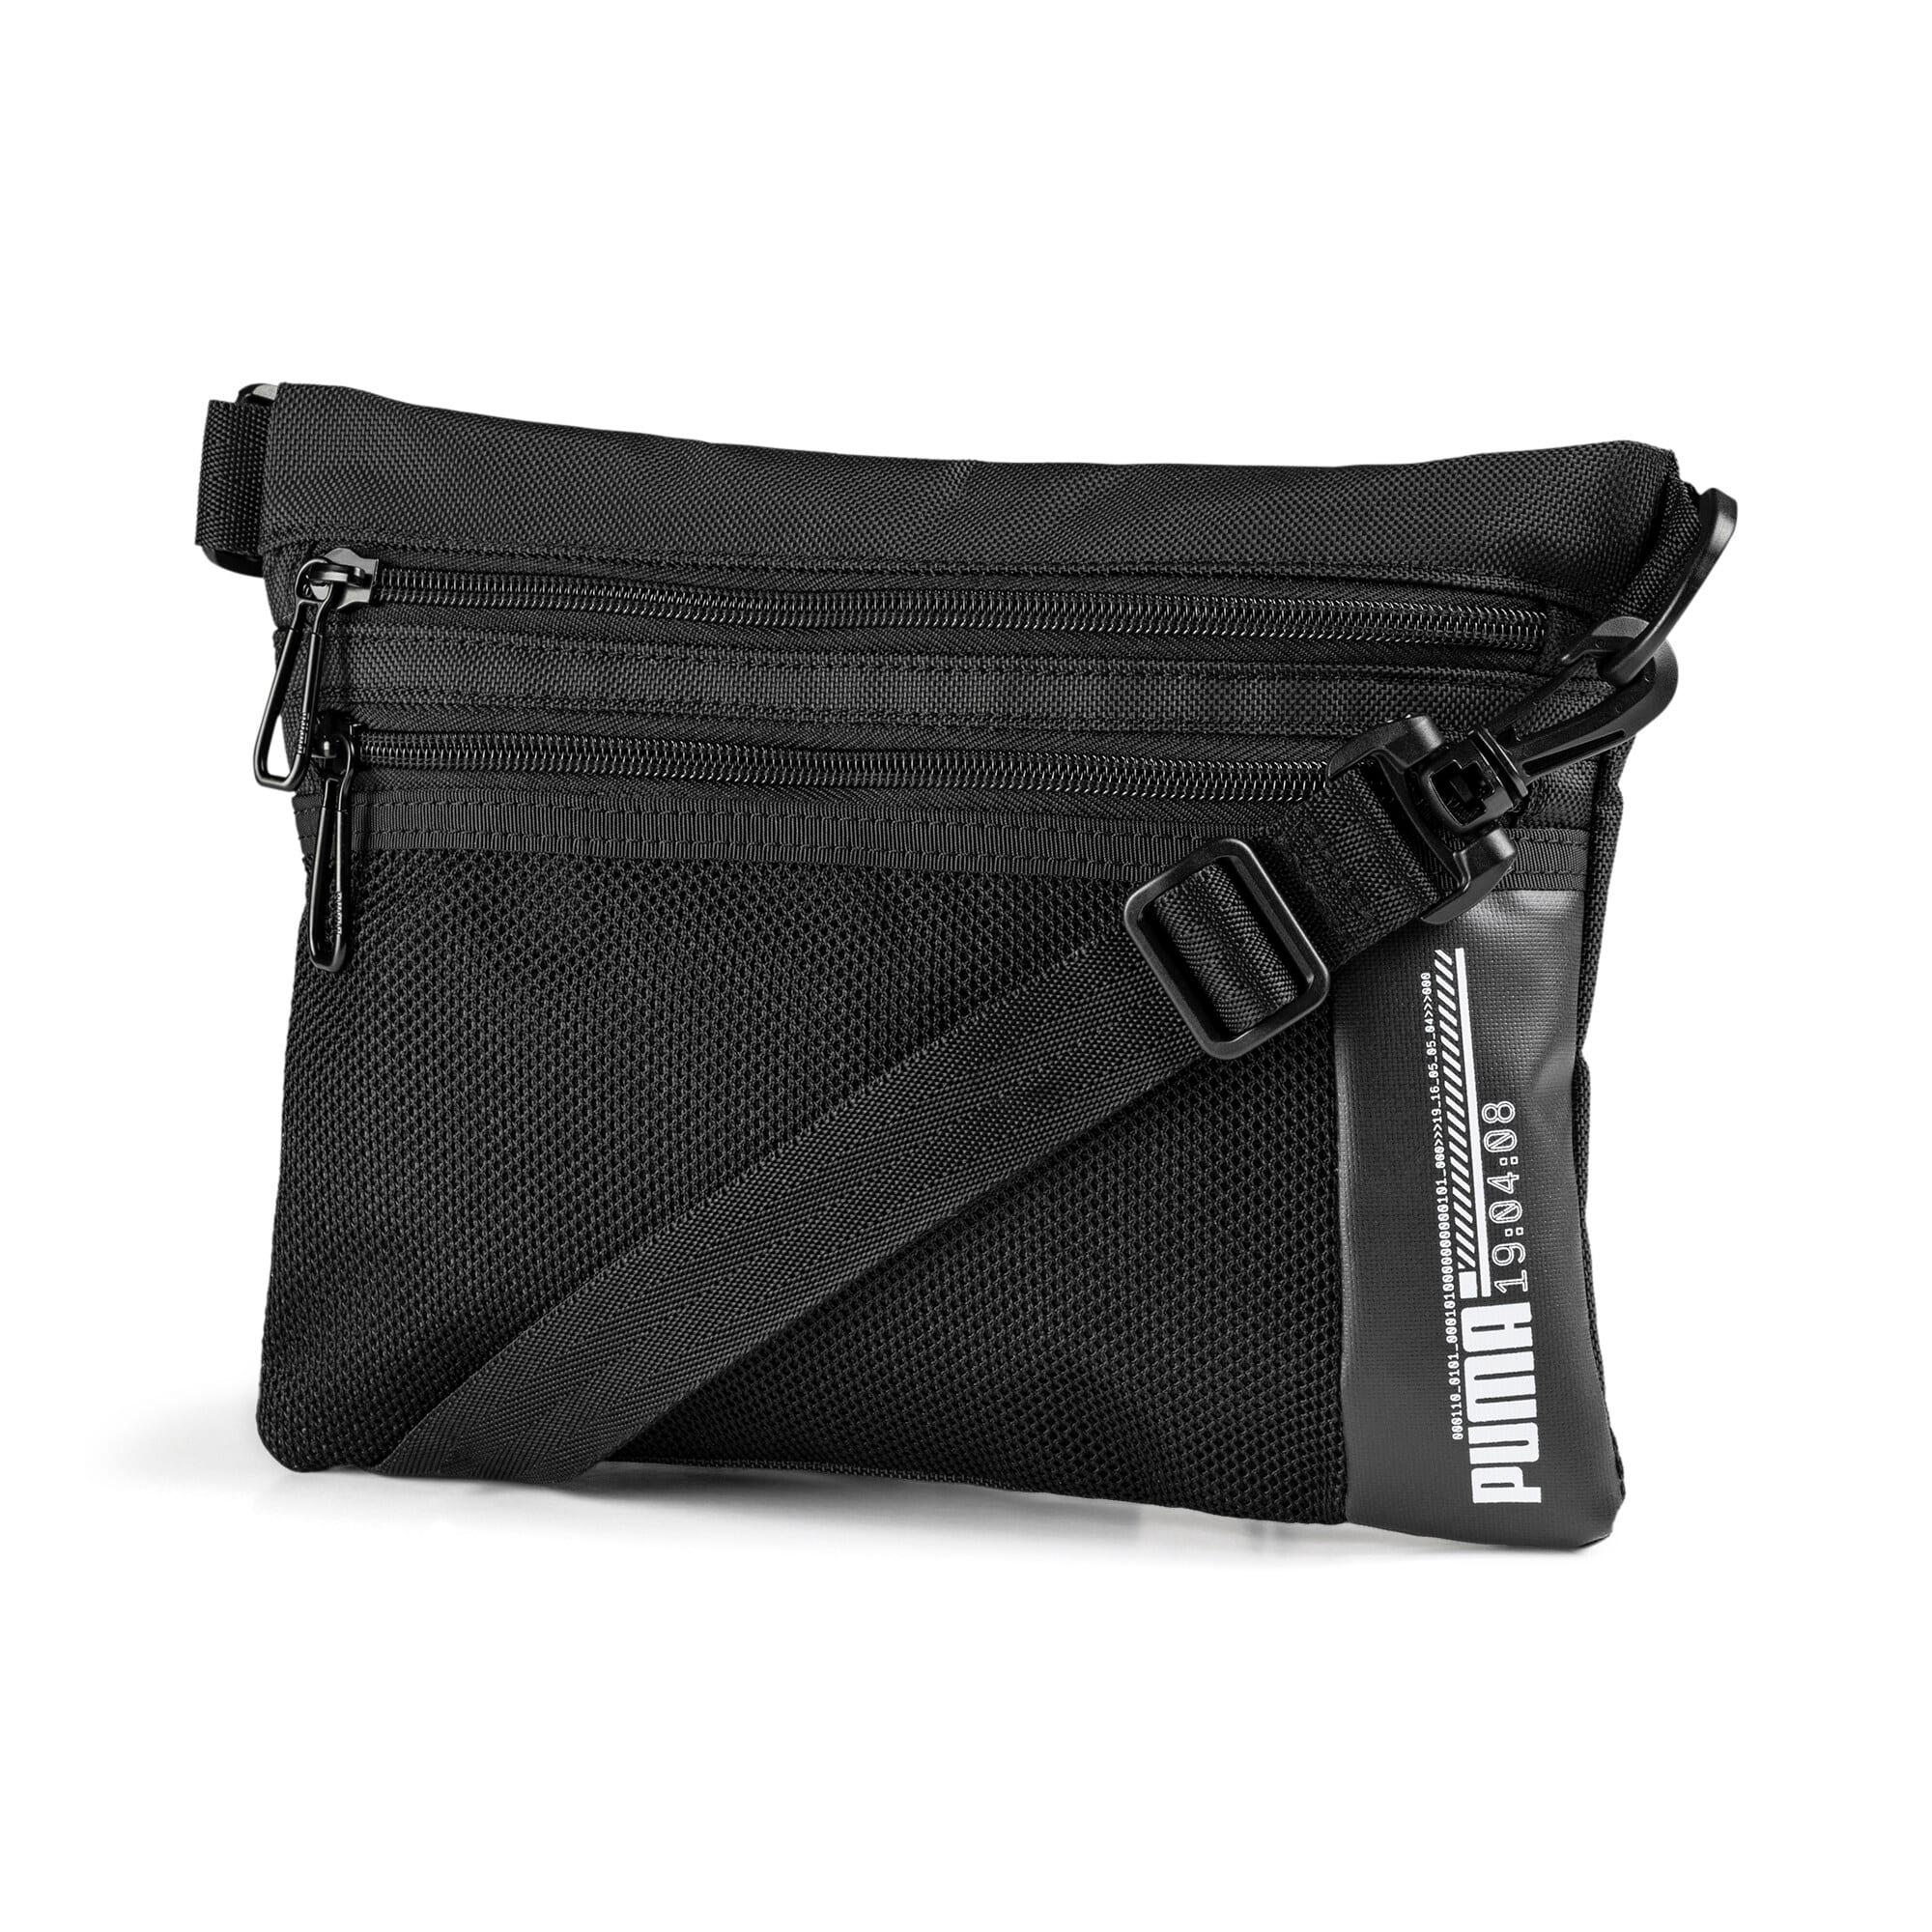 Thumbnail 1 of Energy Sacoche Bag, Puma Black, medium